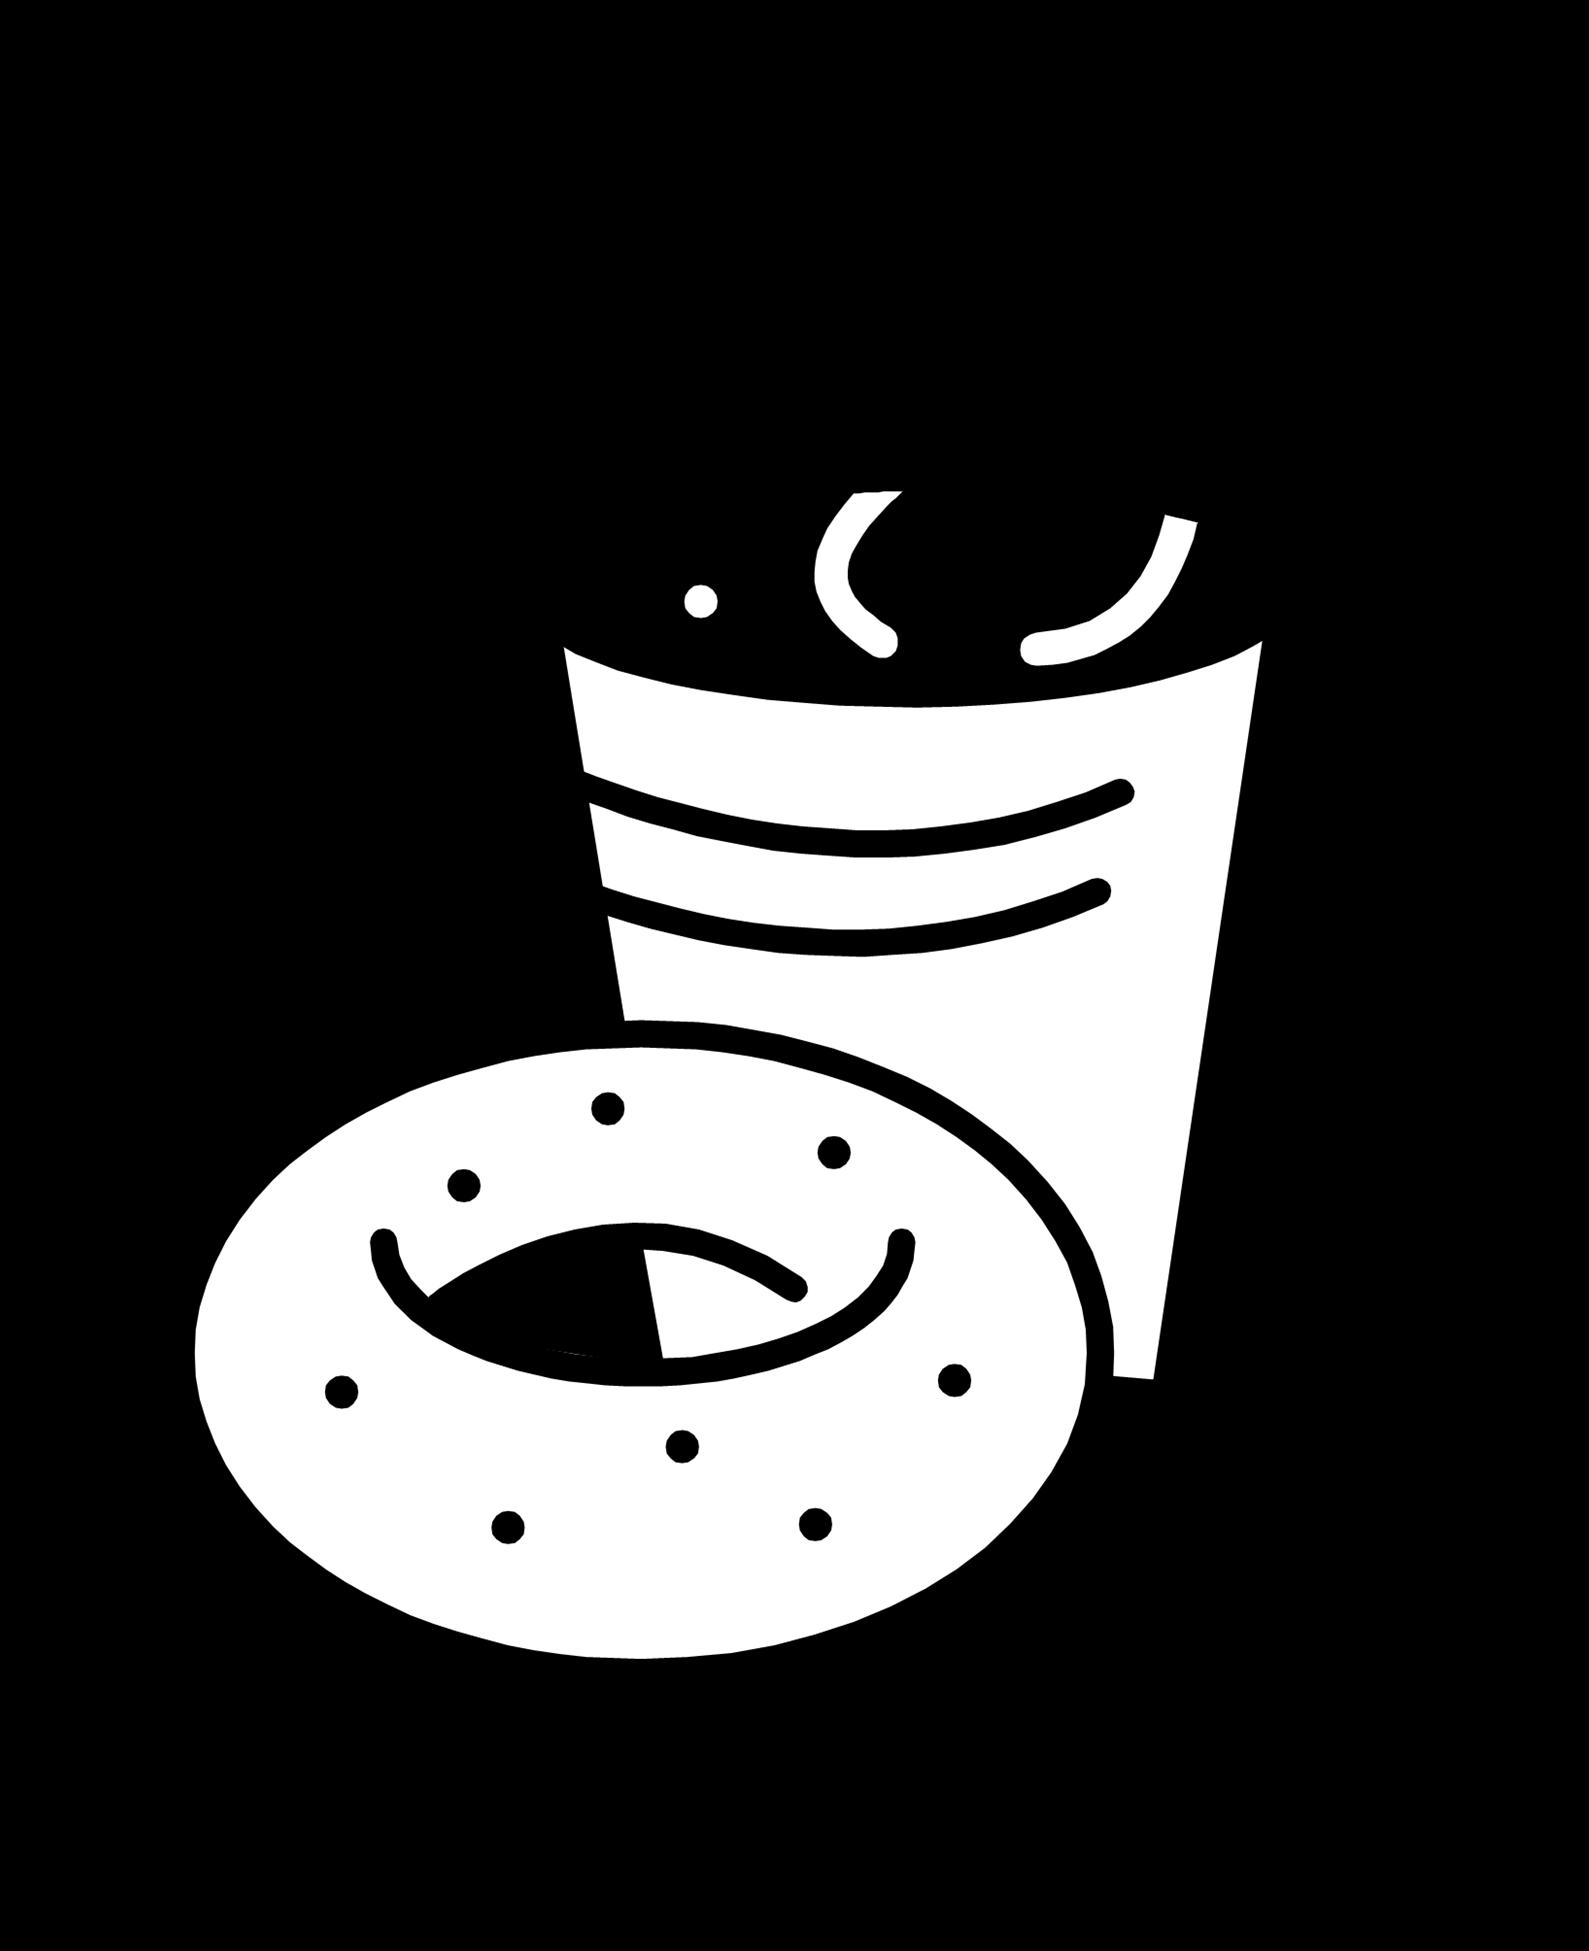 Png royalty free stock. Mug clipart coffee bagel